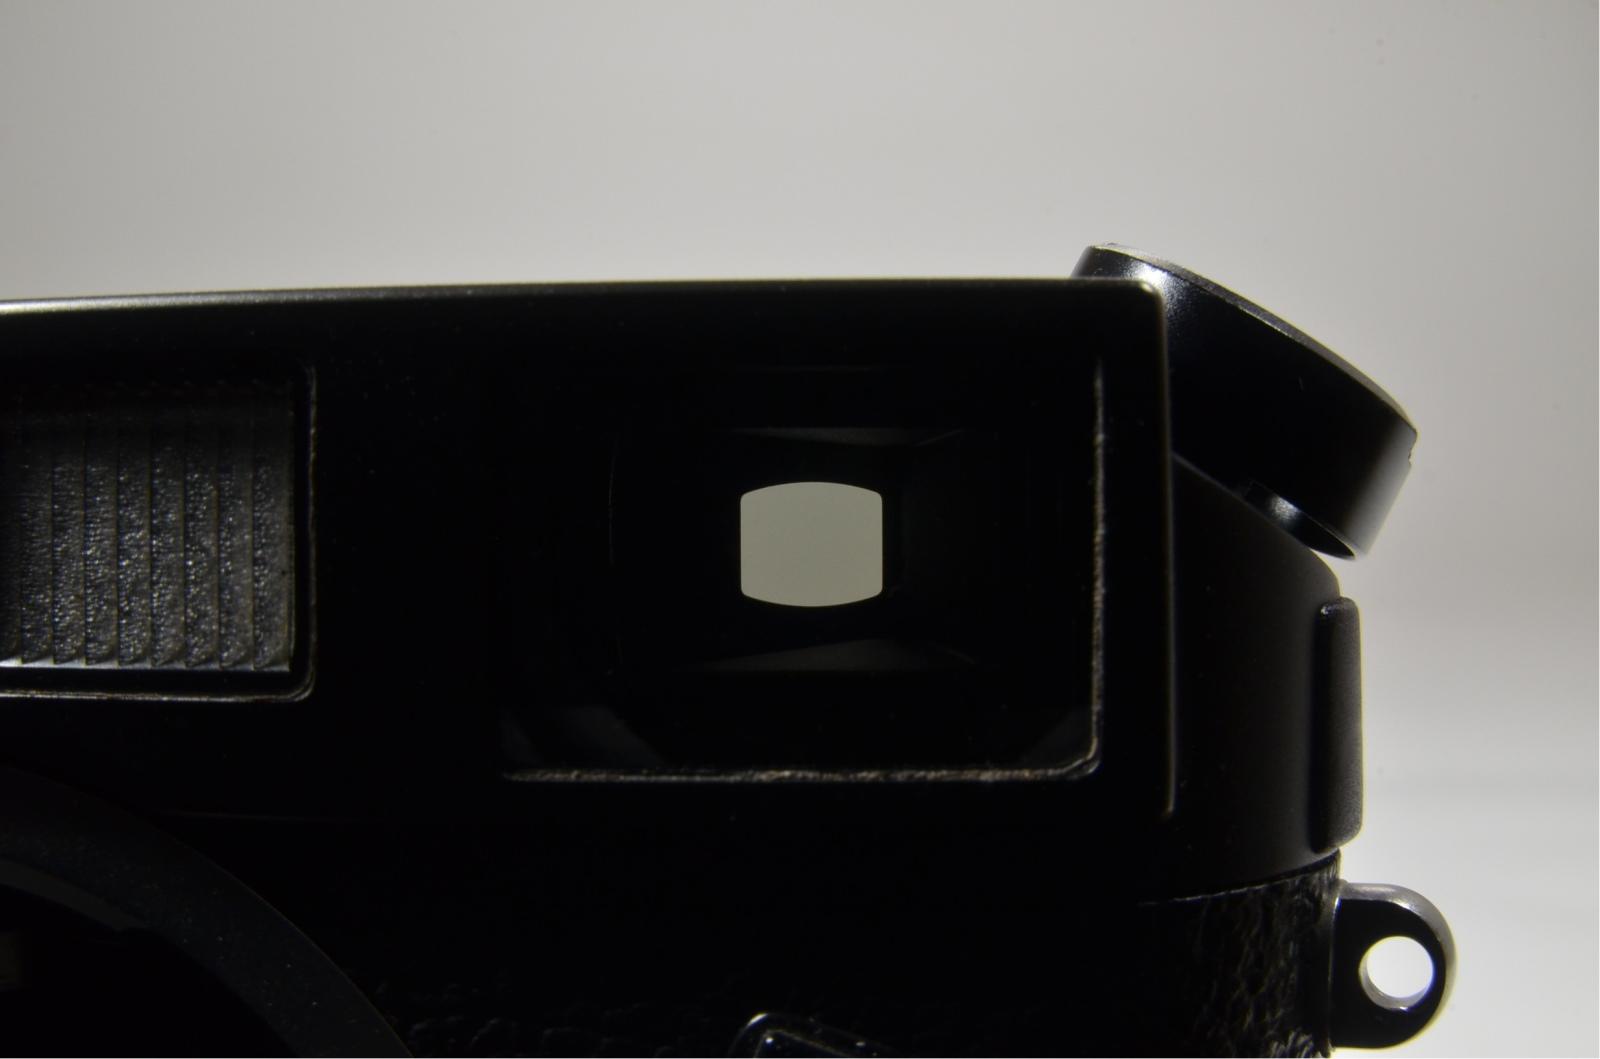 leica m6 0.72 black rangefinder serial no.2415292 year 1997 in boxed